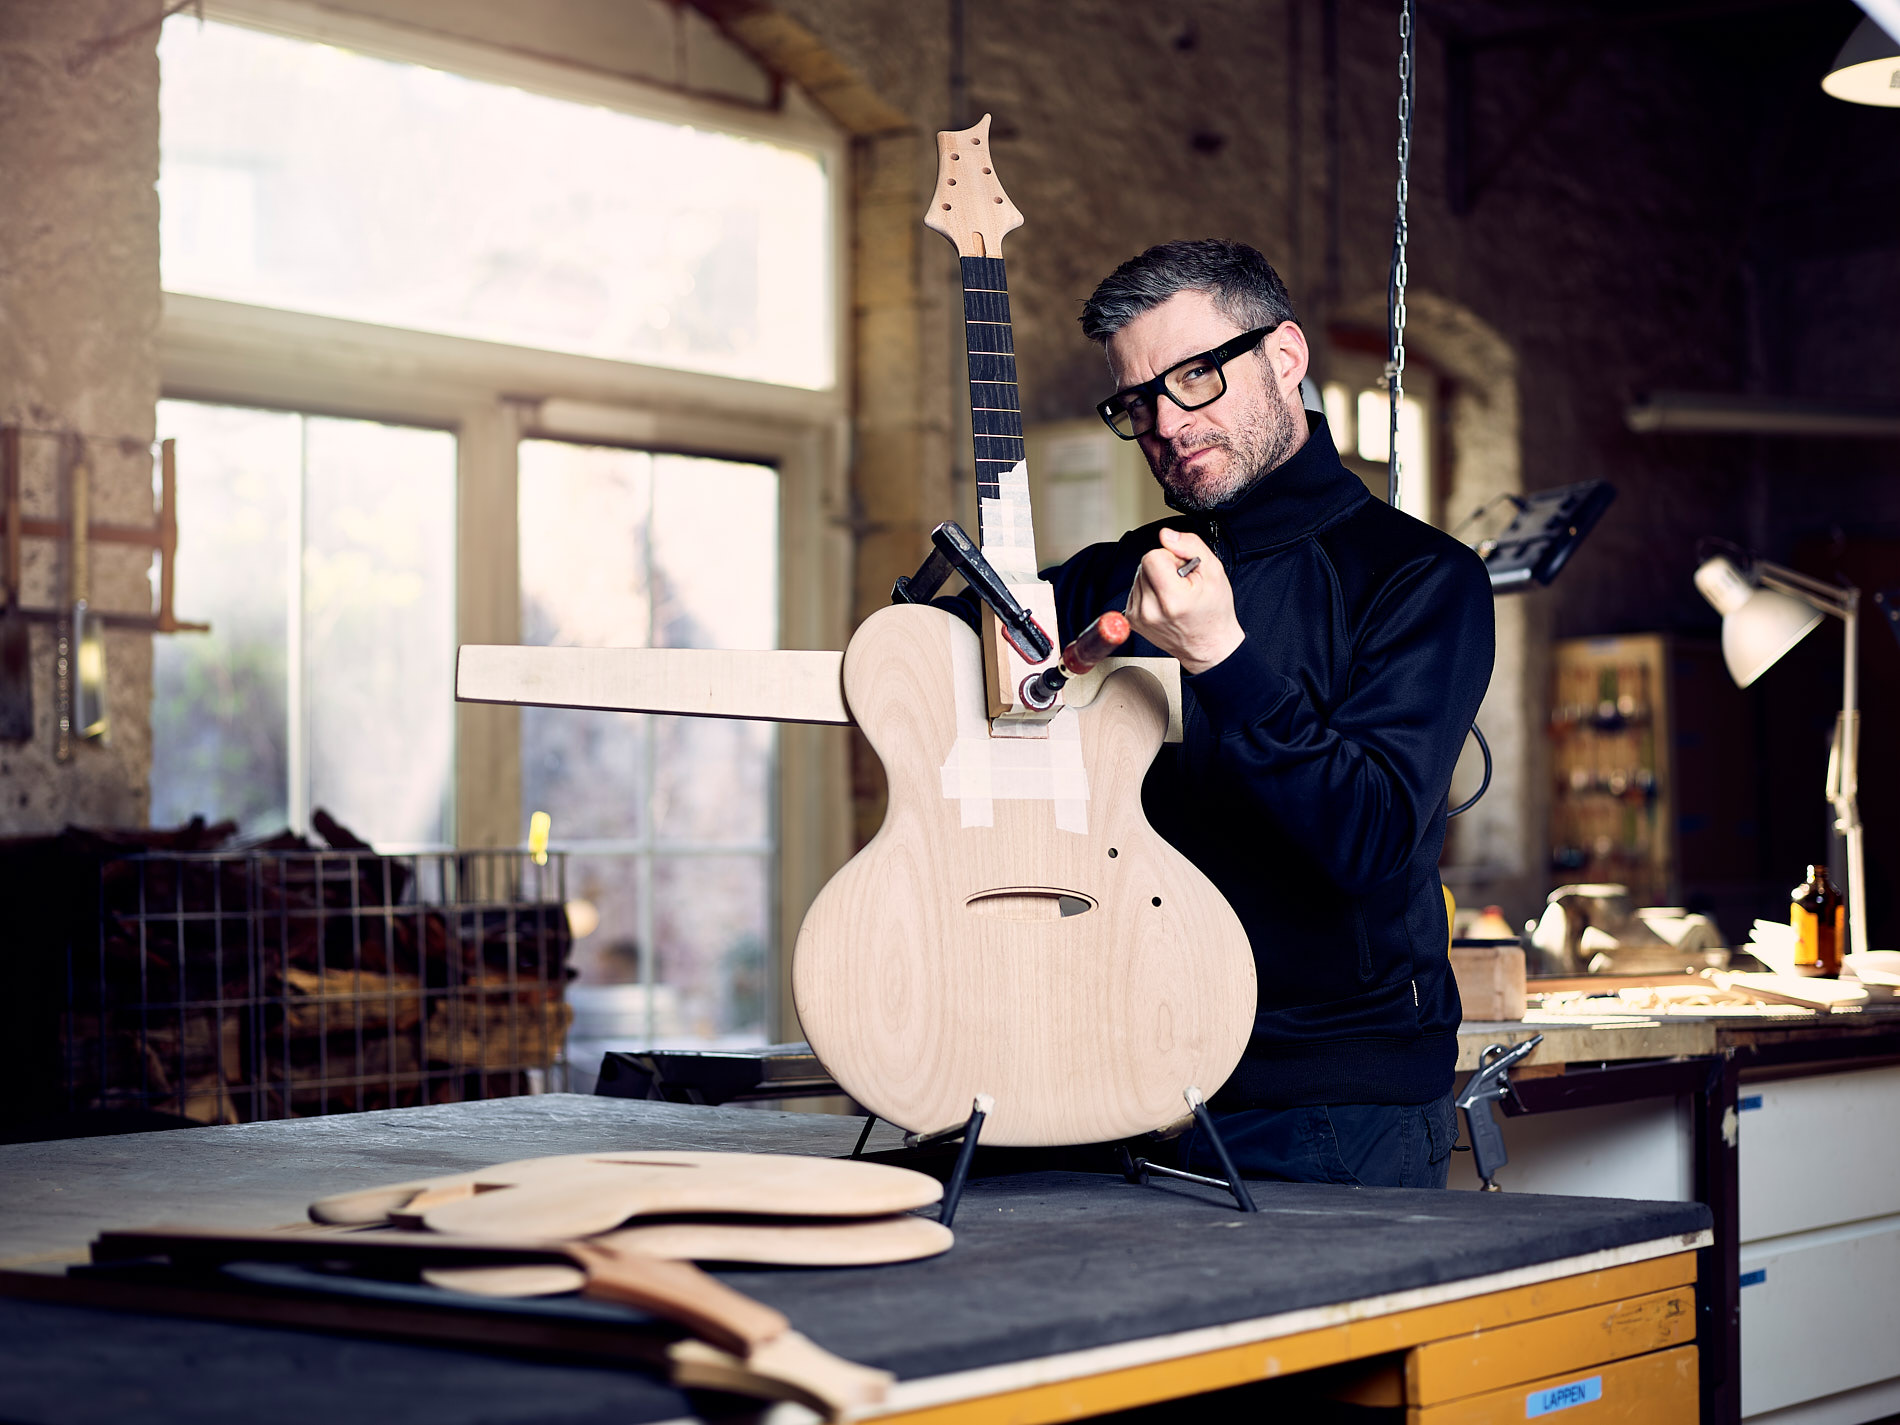 Fabian Hensel Fotograf Mannheim People Portrait Lifestyle